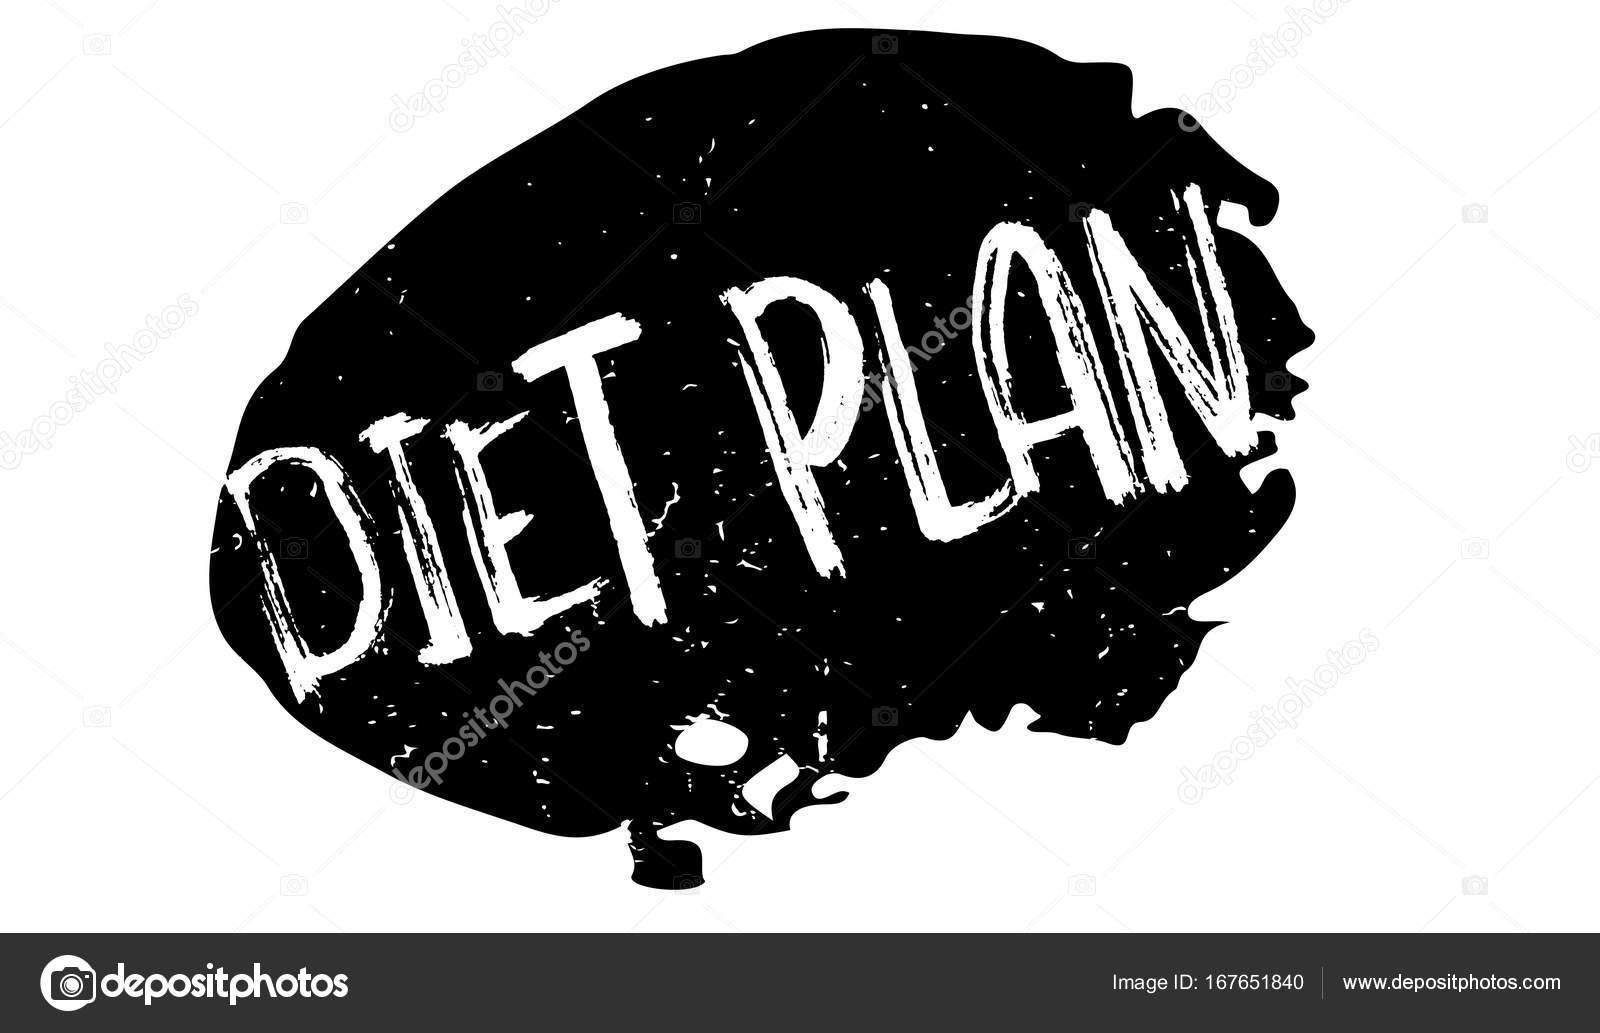 diseño de plan de dieta